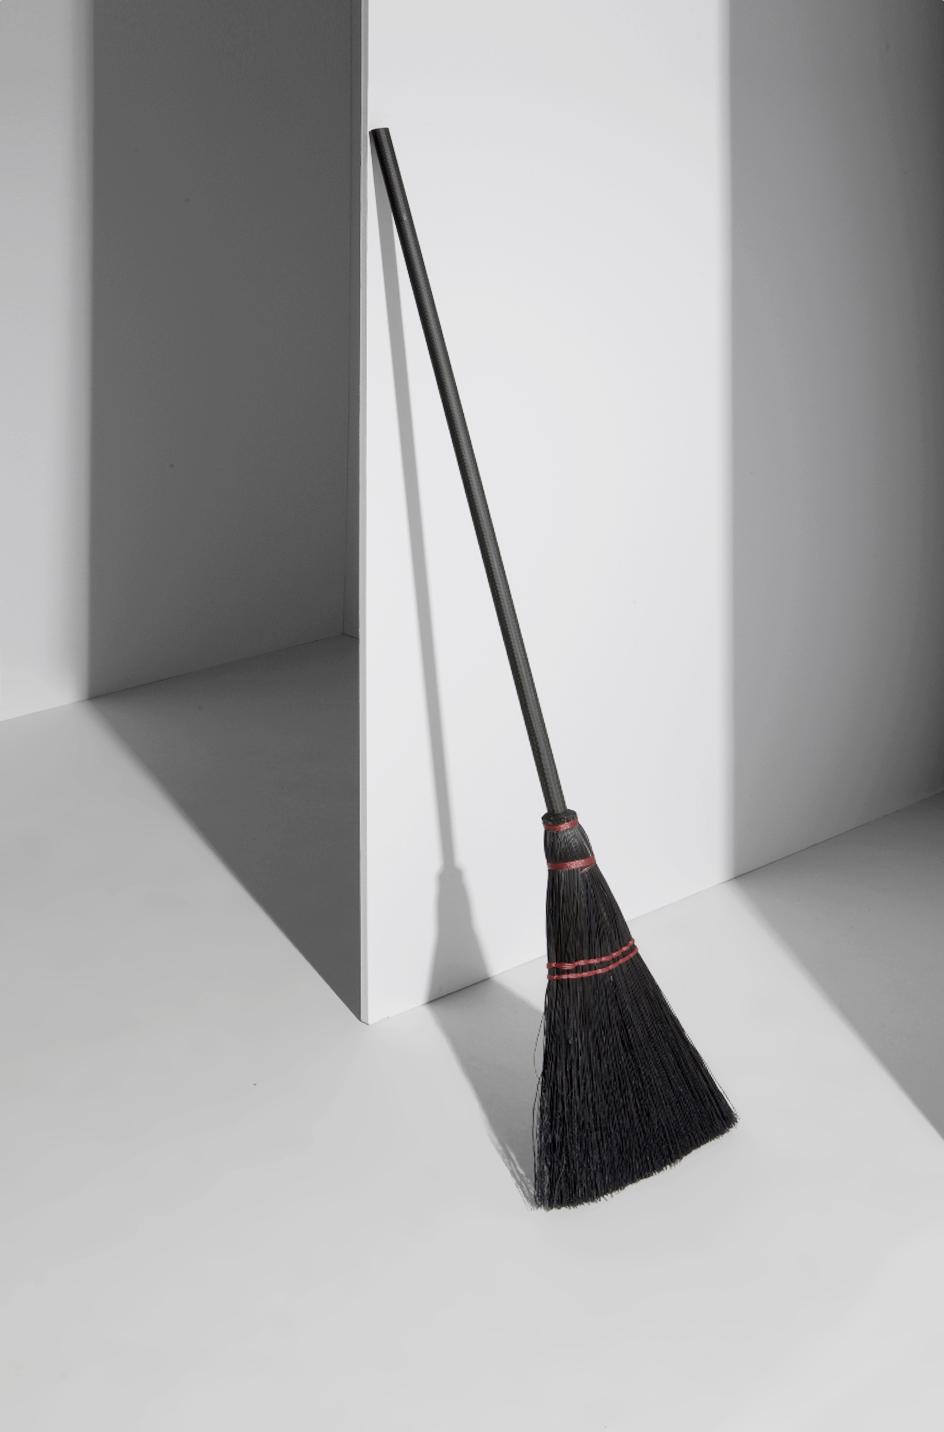 Chris_Specce_Ultra Broom.jpg